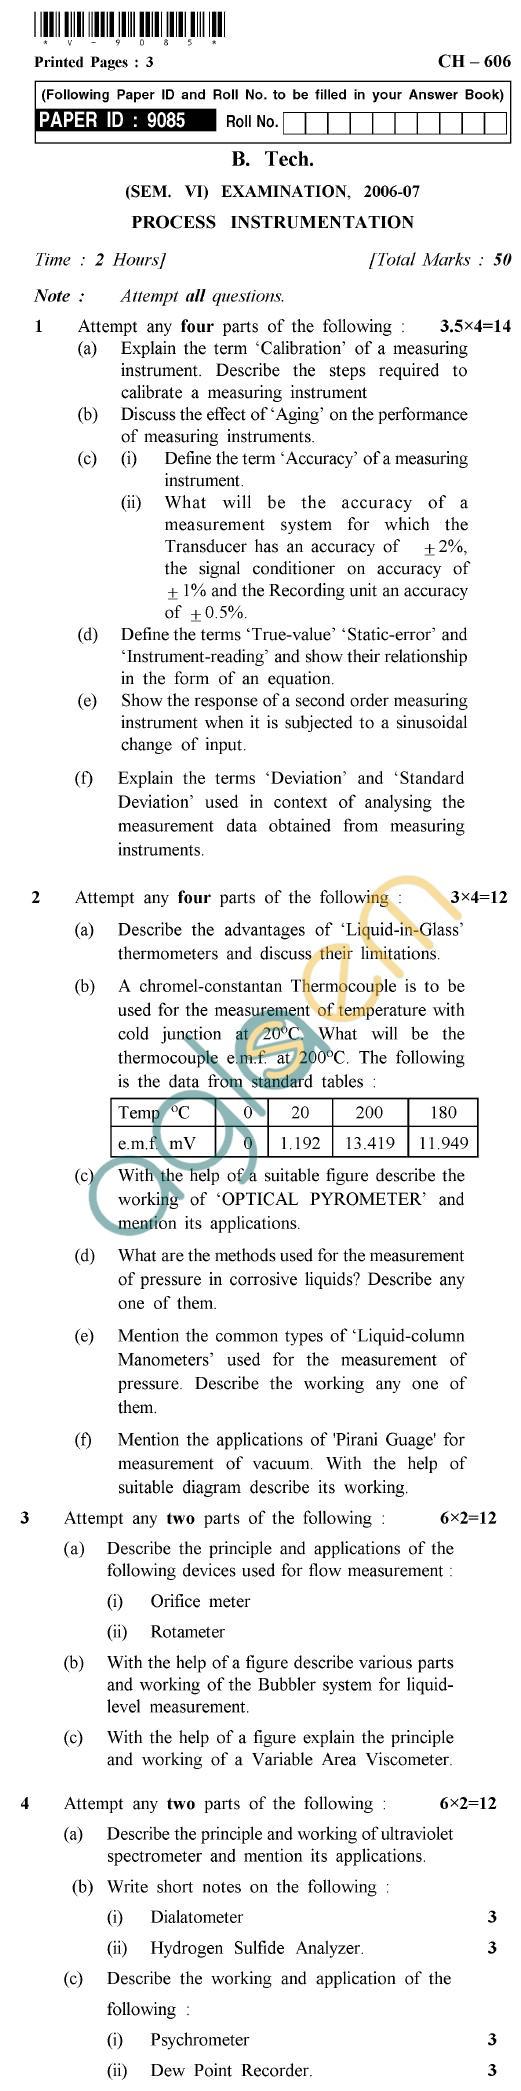 UPTU B.Tech Question Papers - CH-606 - Process Instrumentation